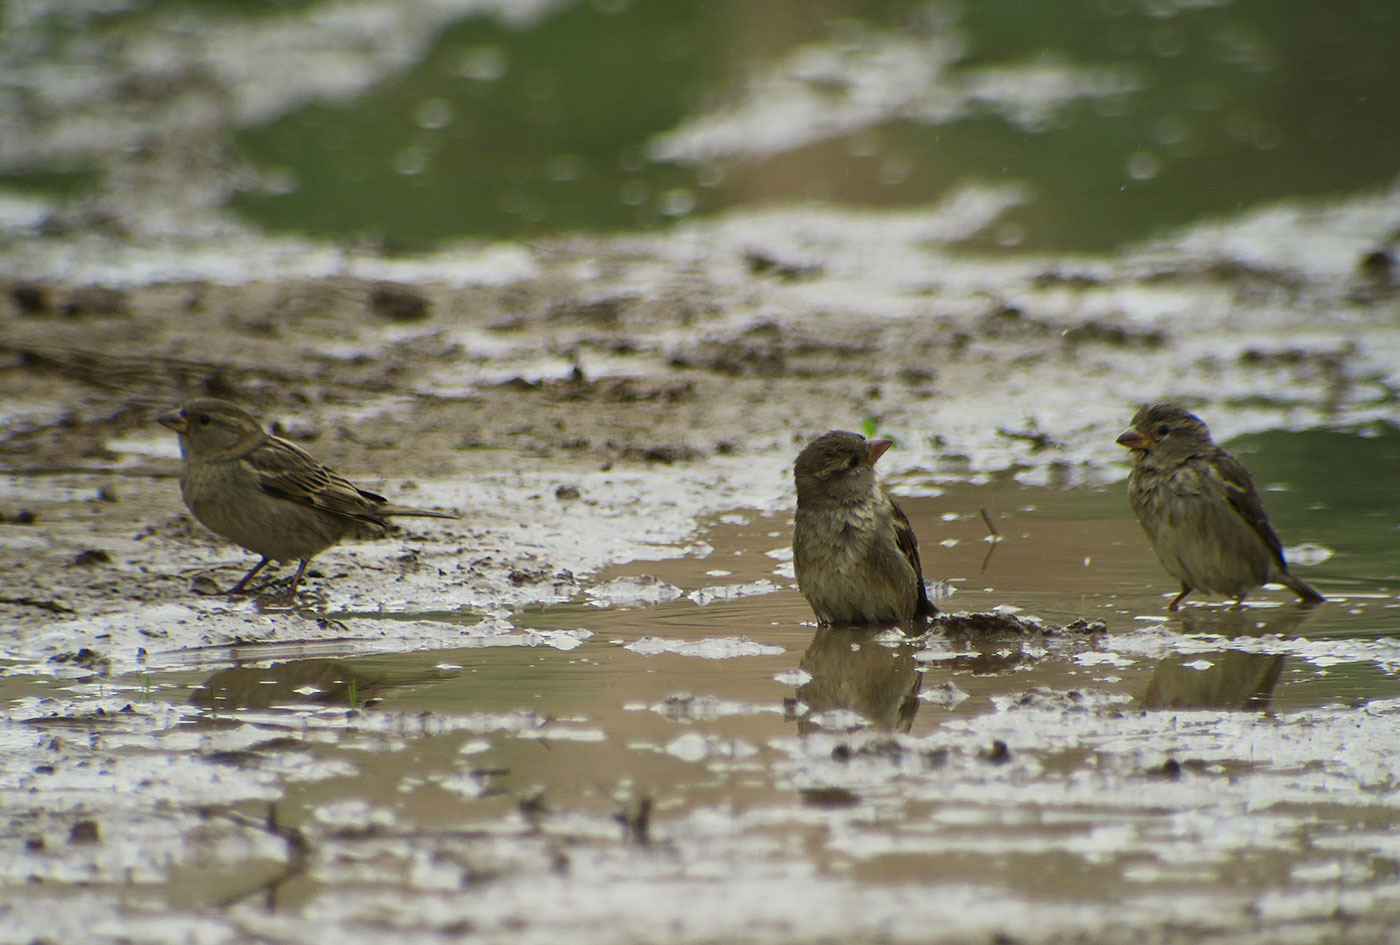 23_haussperling_house-sparrow_massa_marokko_2018-11-25_4033